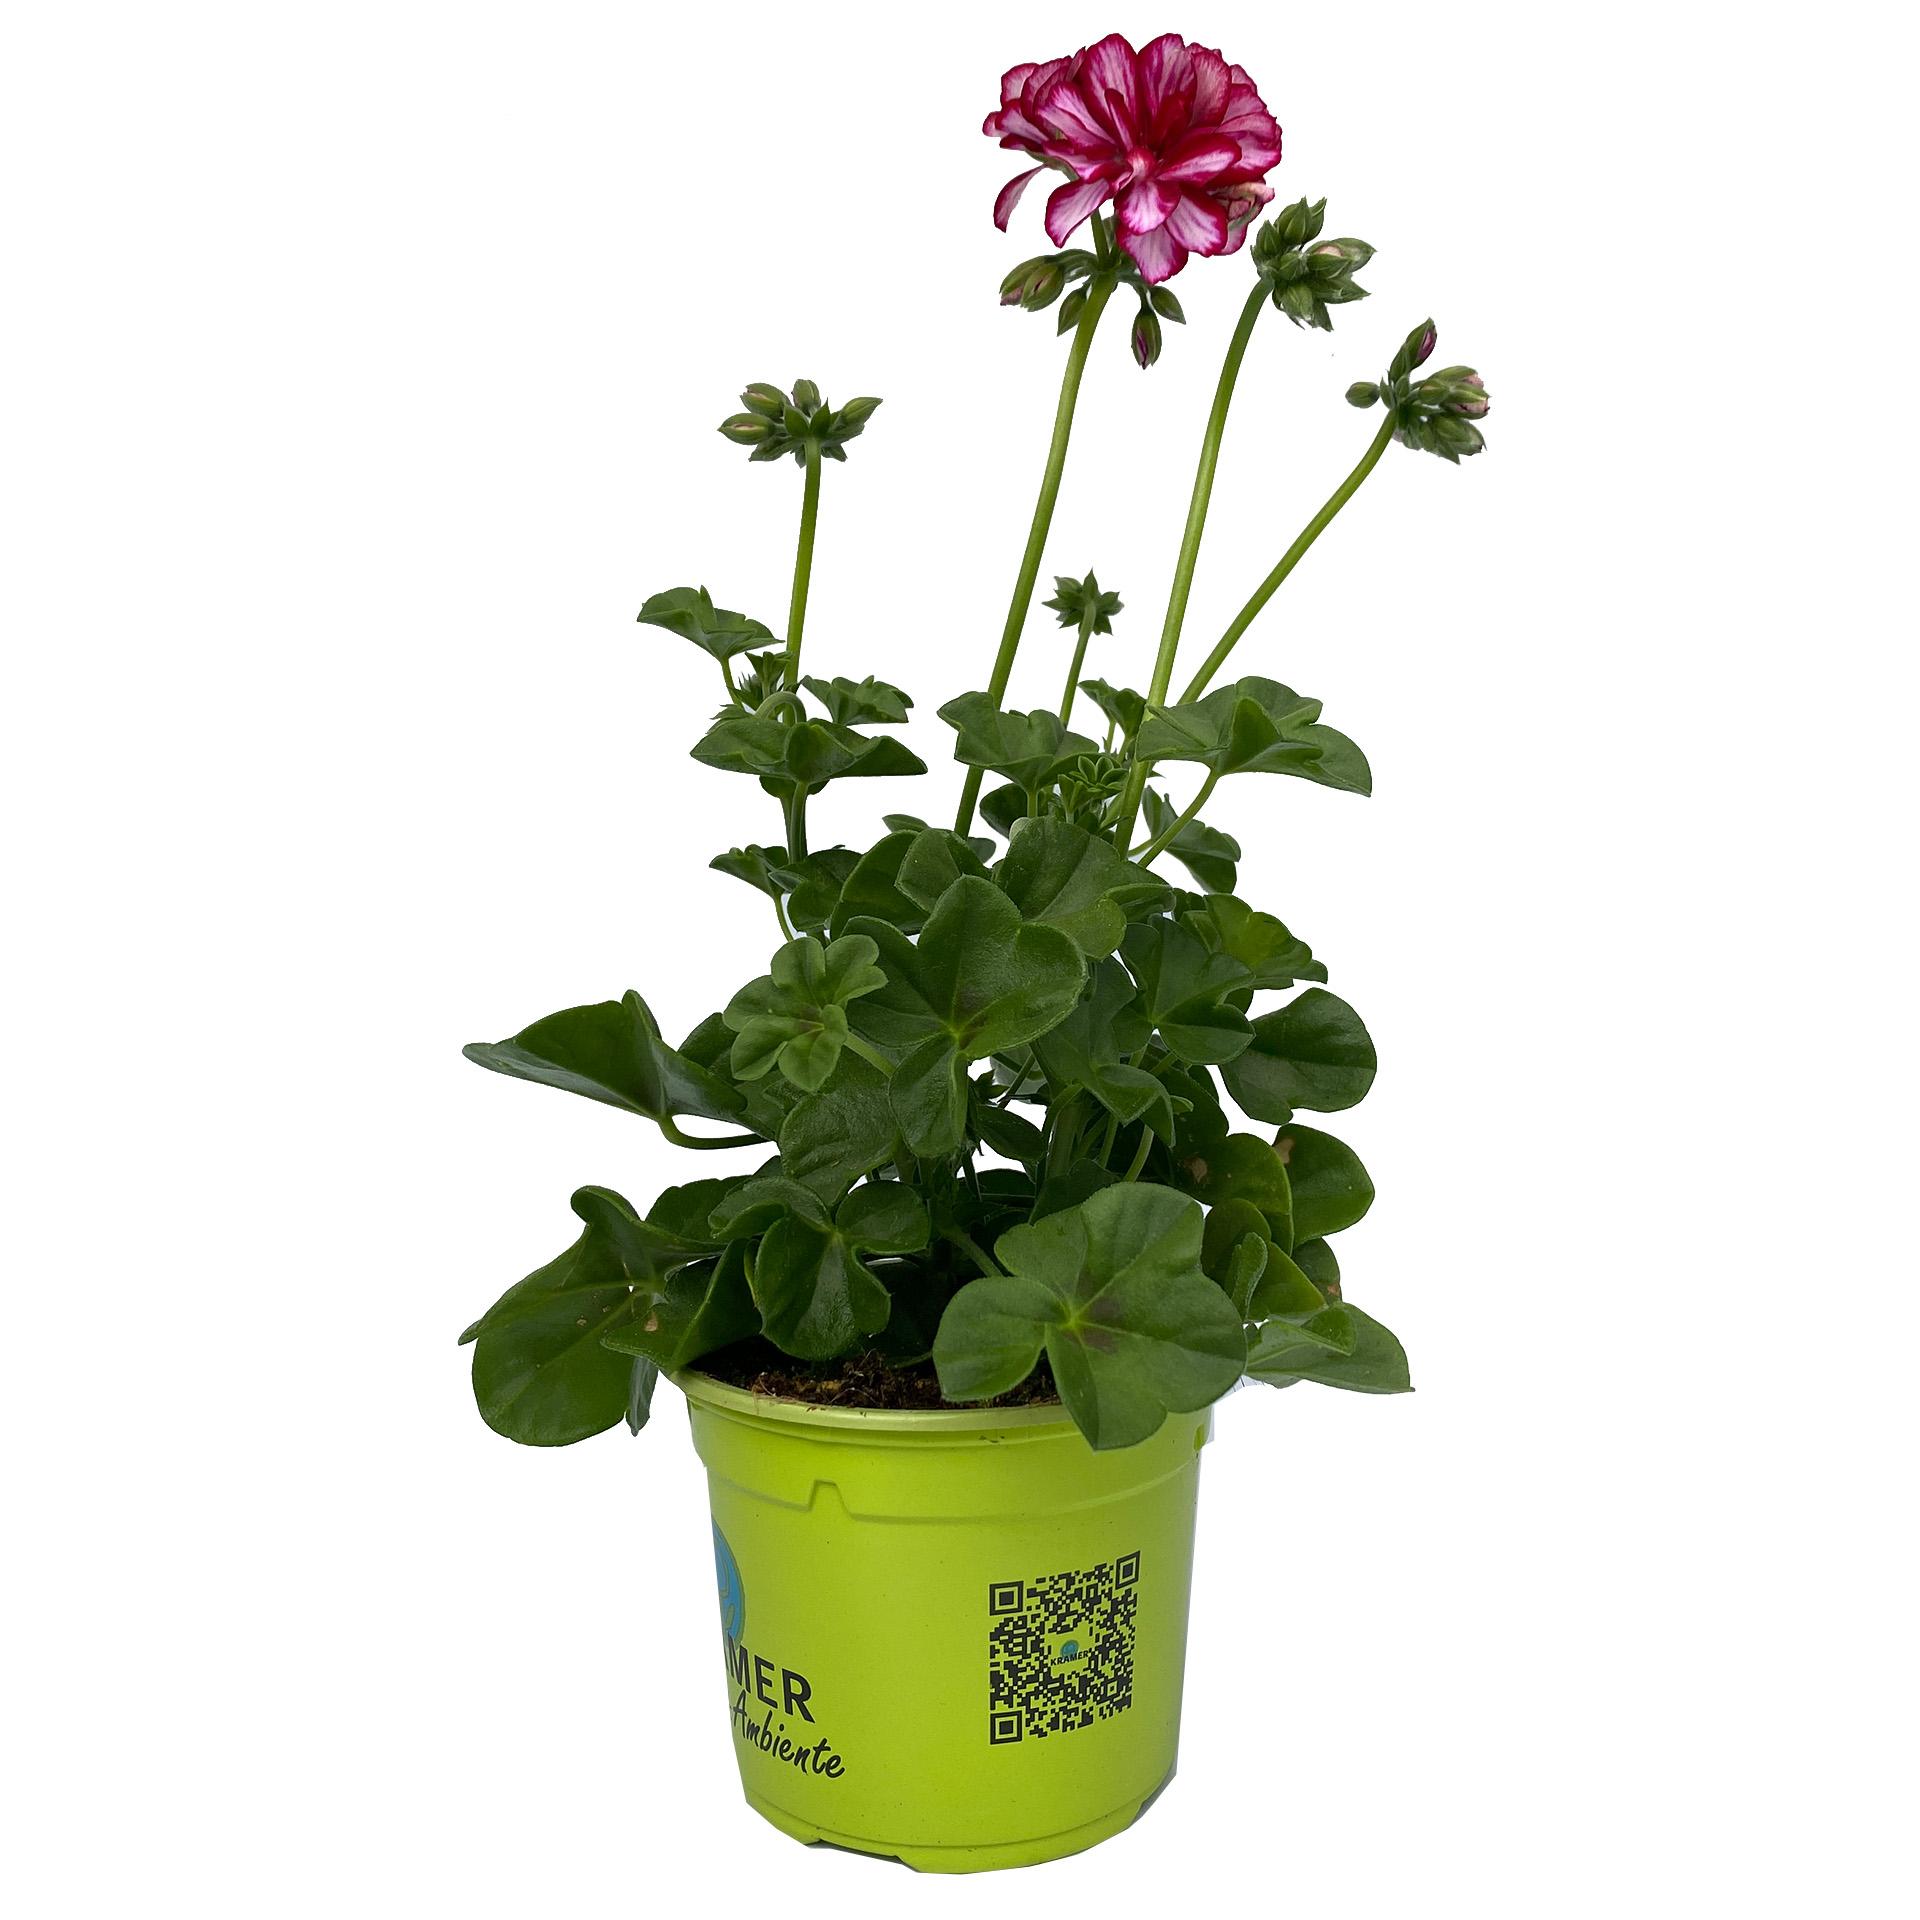 Geranie hängend - Pelargonium peltatum 'Medio Lollipop Nixe' weiß/rot, 12cm Topf